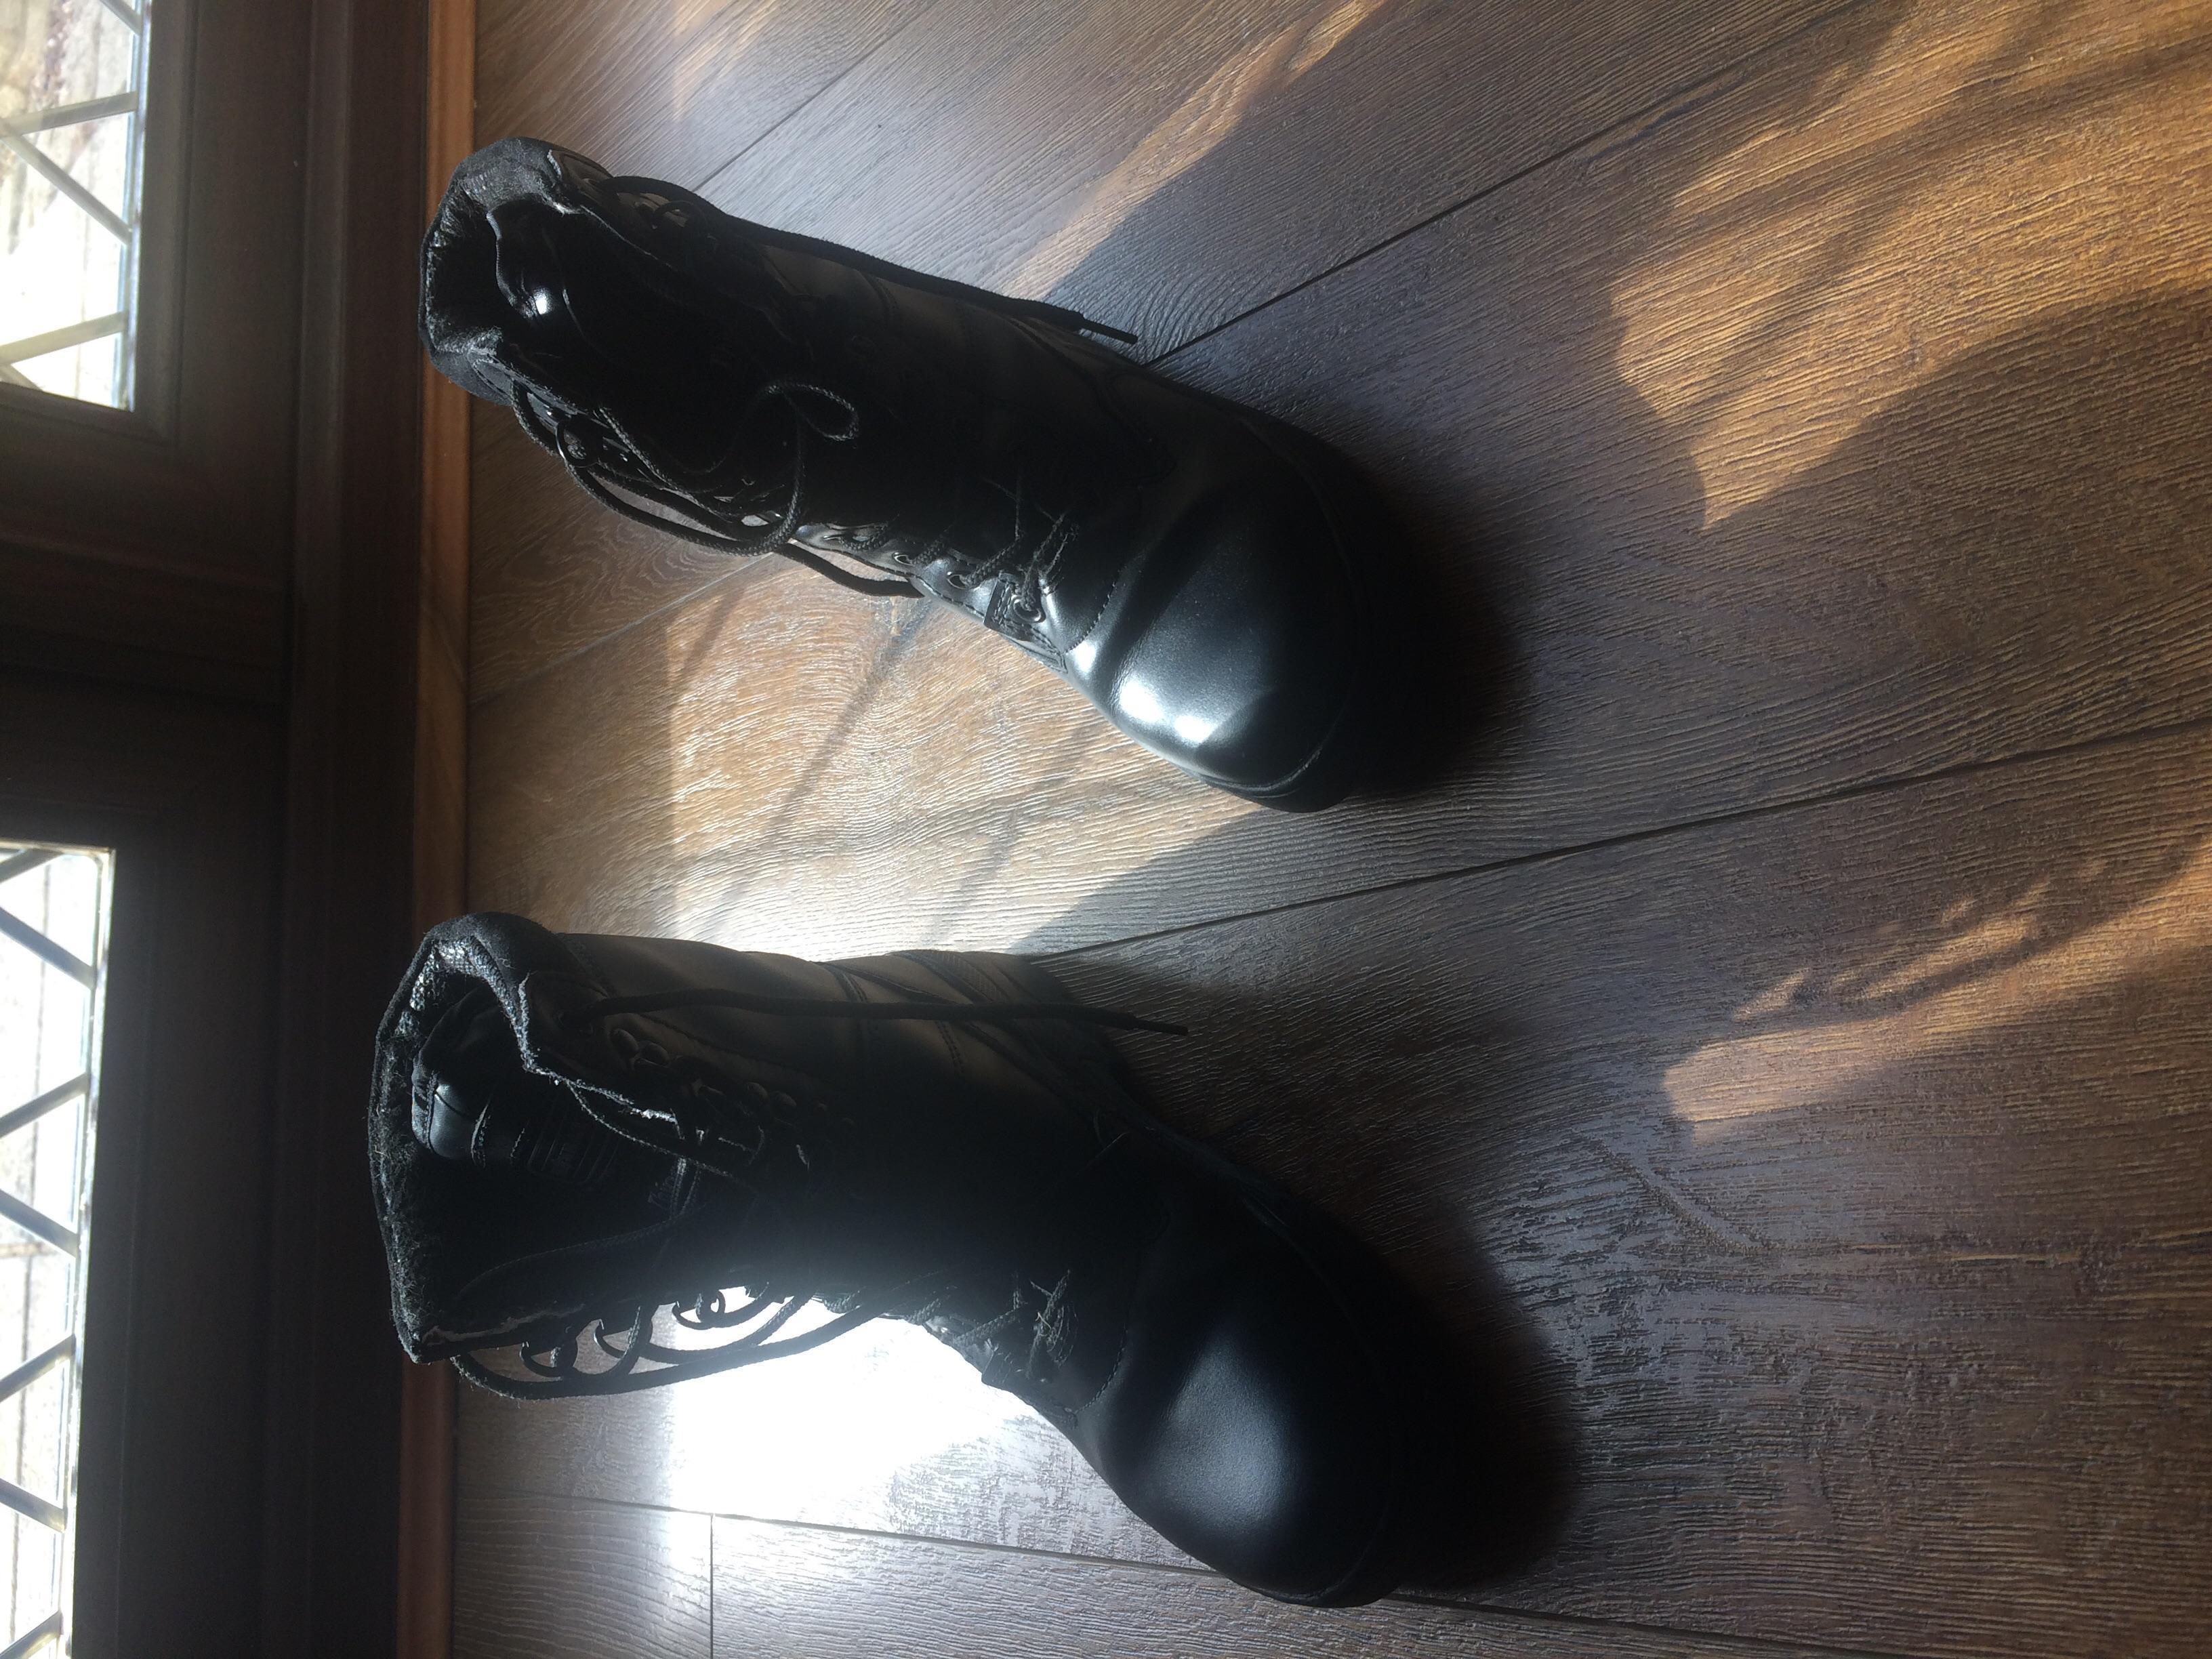 b42d5aee015 Kombat patrol boots in Belper - Expired | Friday-Ad